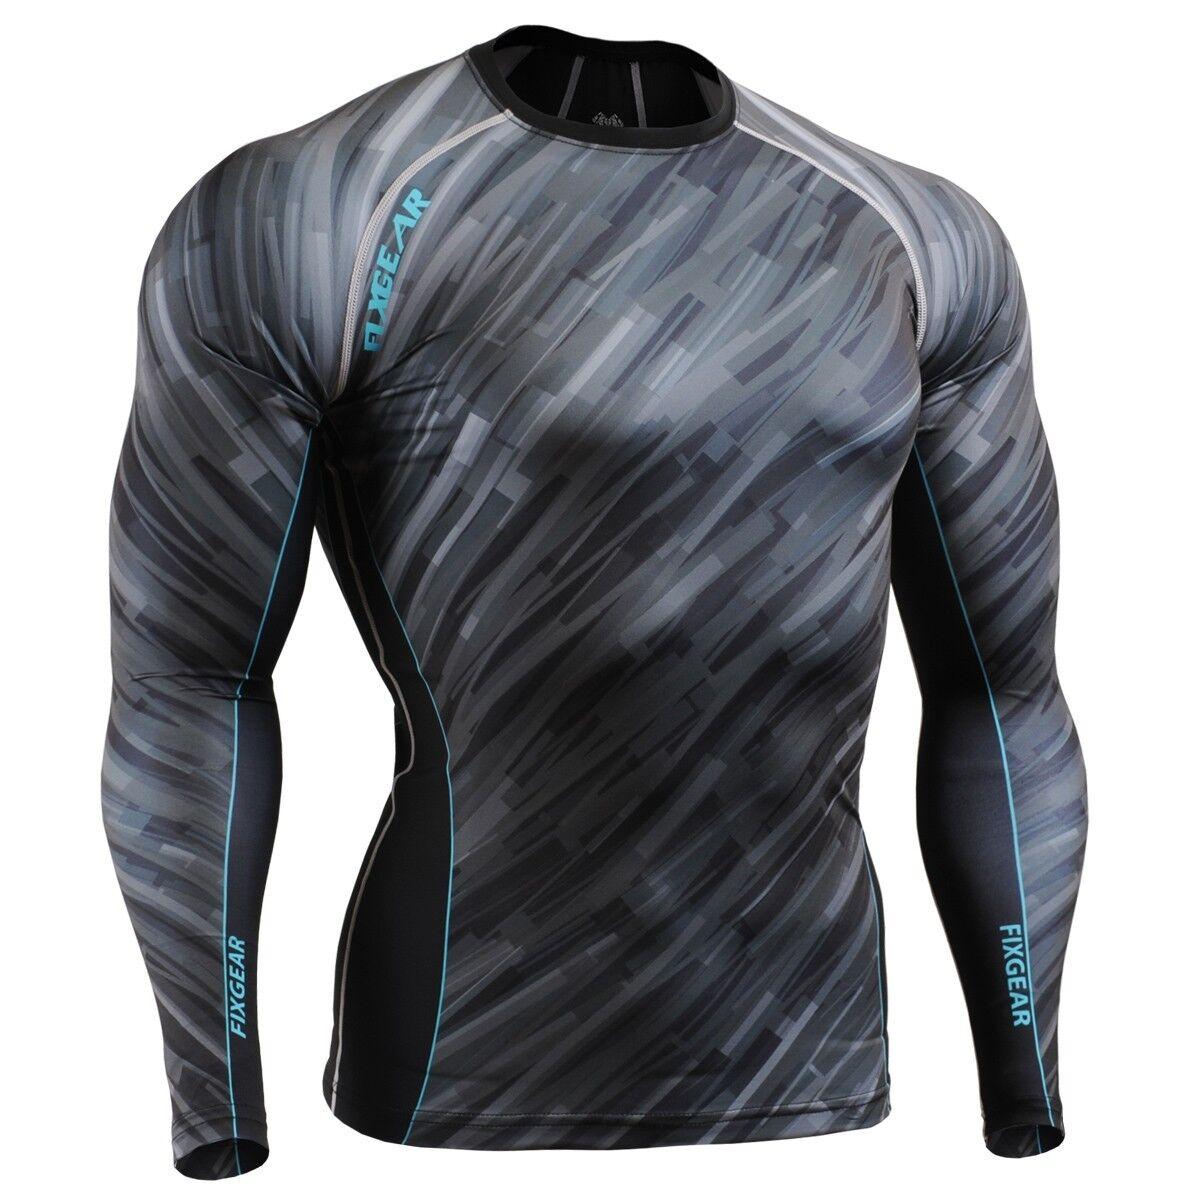 FIXGEAR CFL-67 Compression Shirt Sportswear Bodybuilding Workout Crossfit GYM